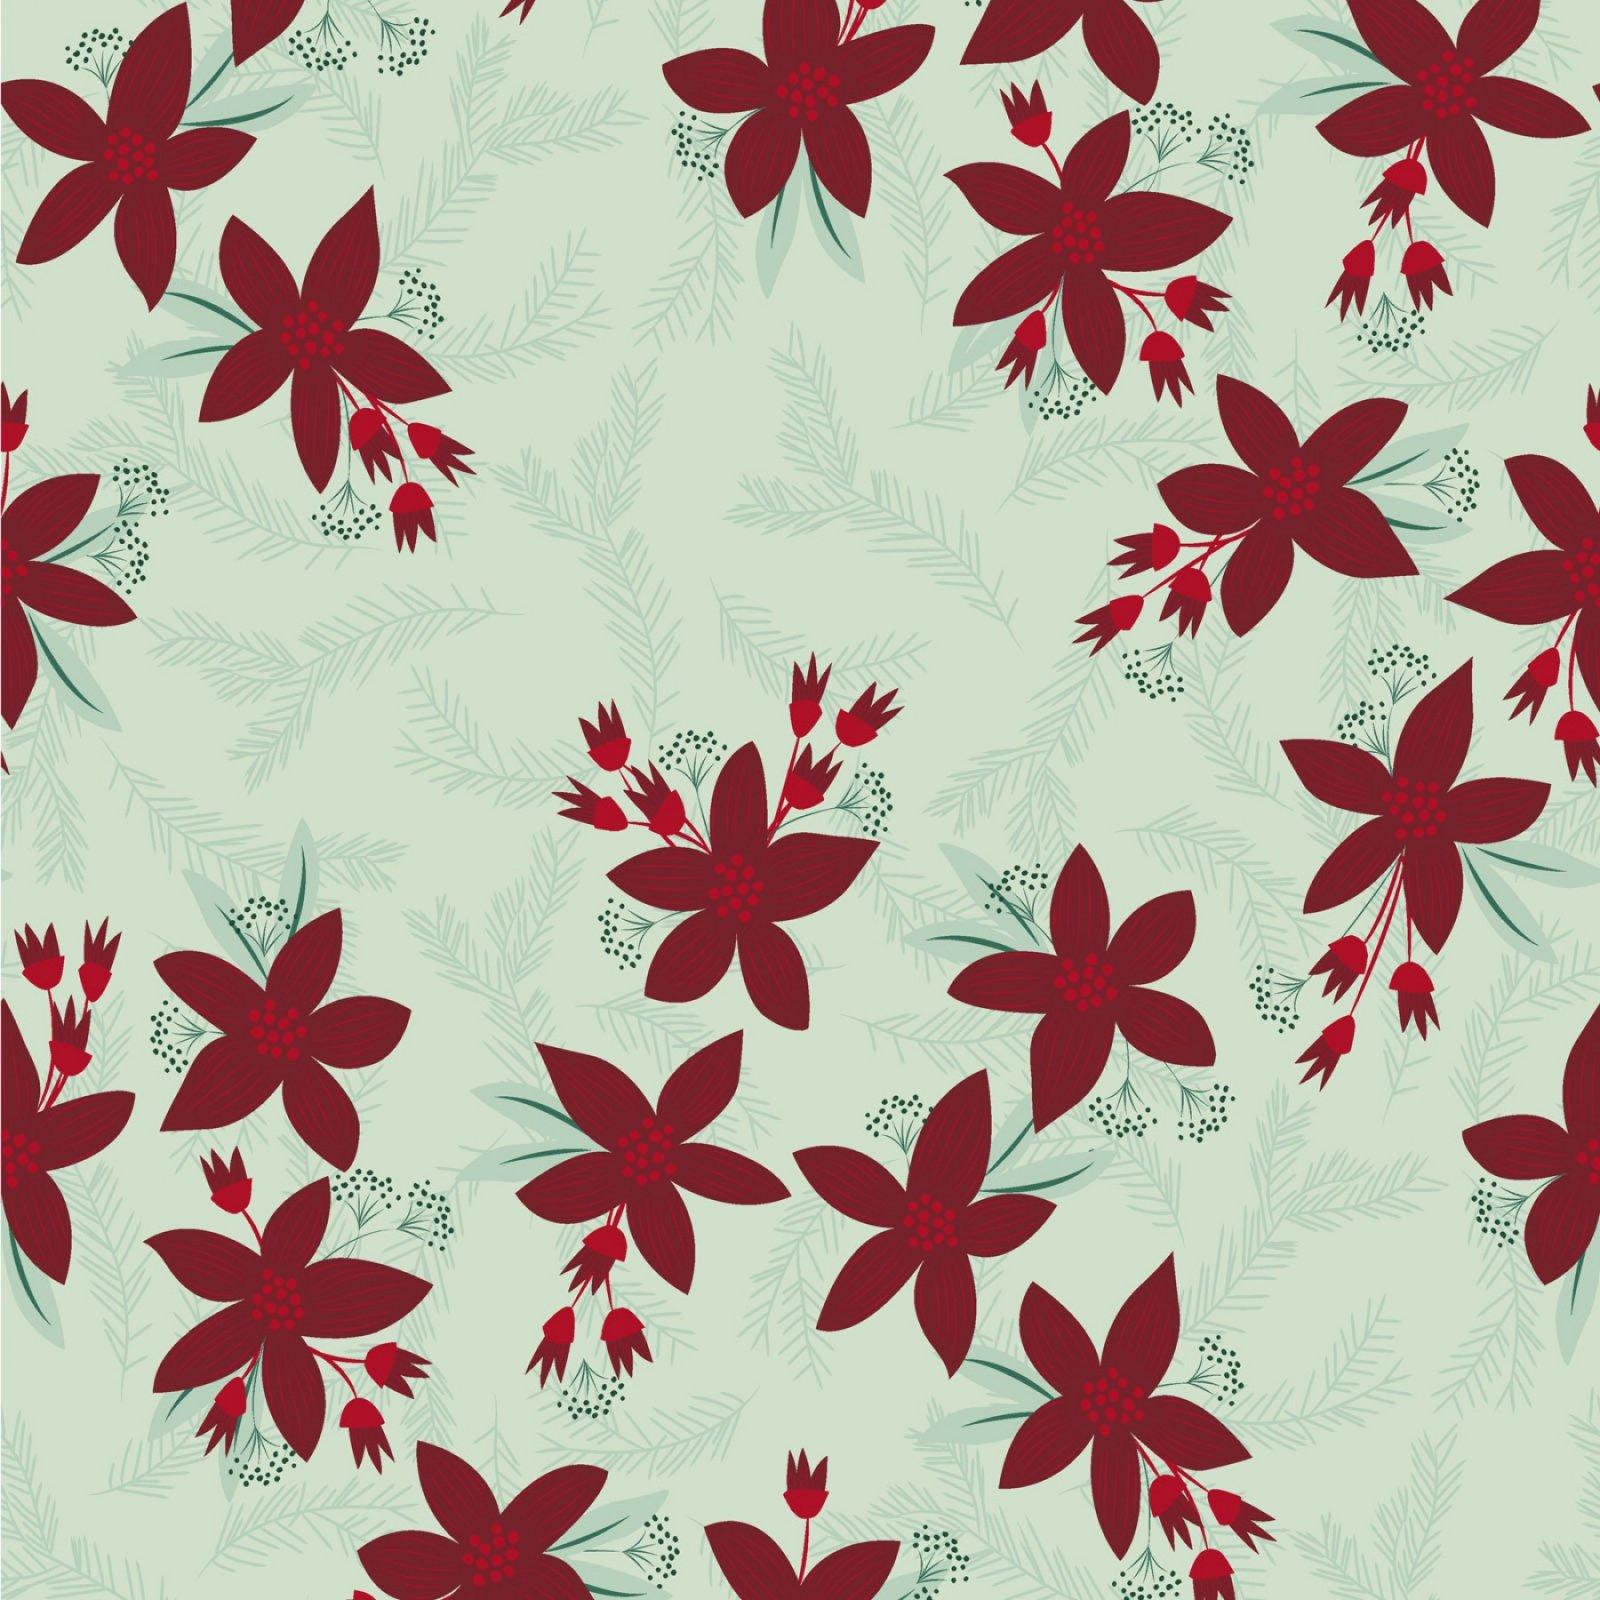 Yuletide - Poinsettia - Light Mint